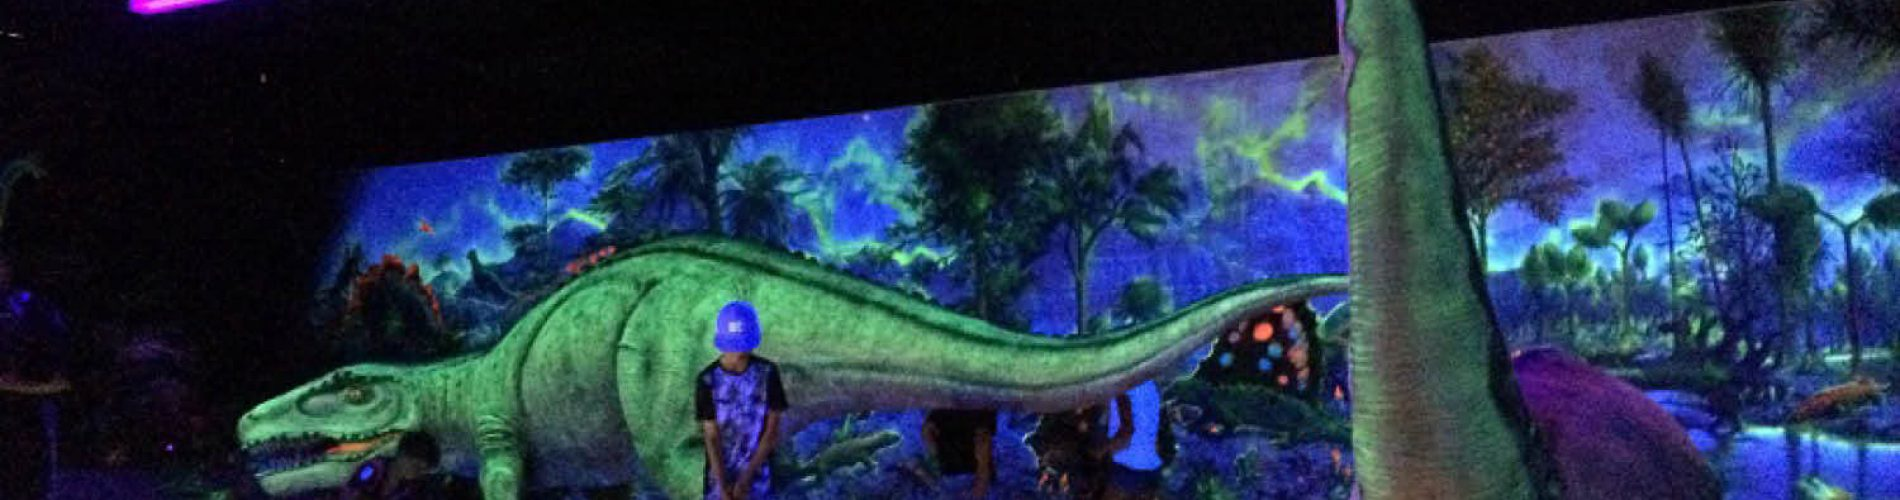 Prehistoric-Mini-Golf-Course-Glow-Golf-1